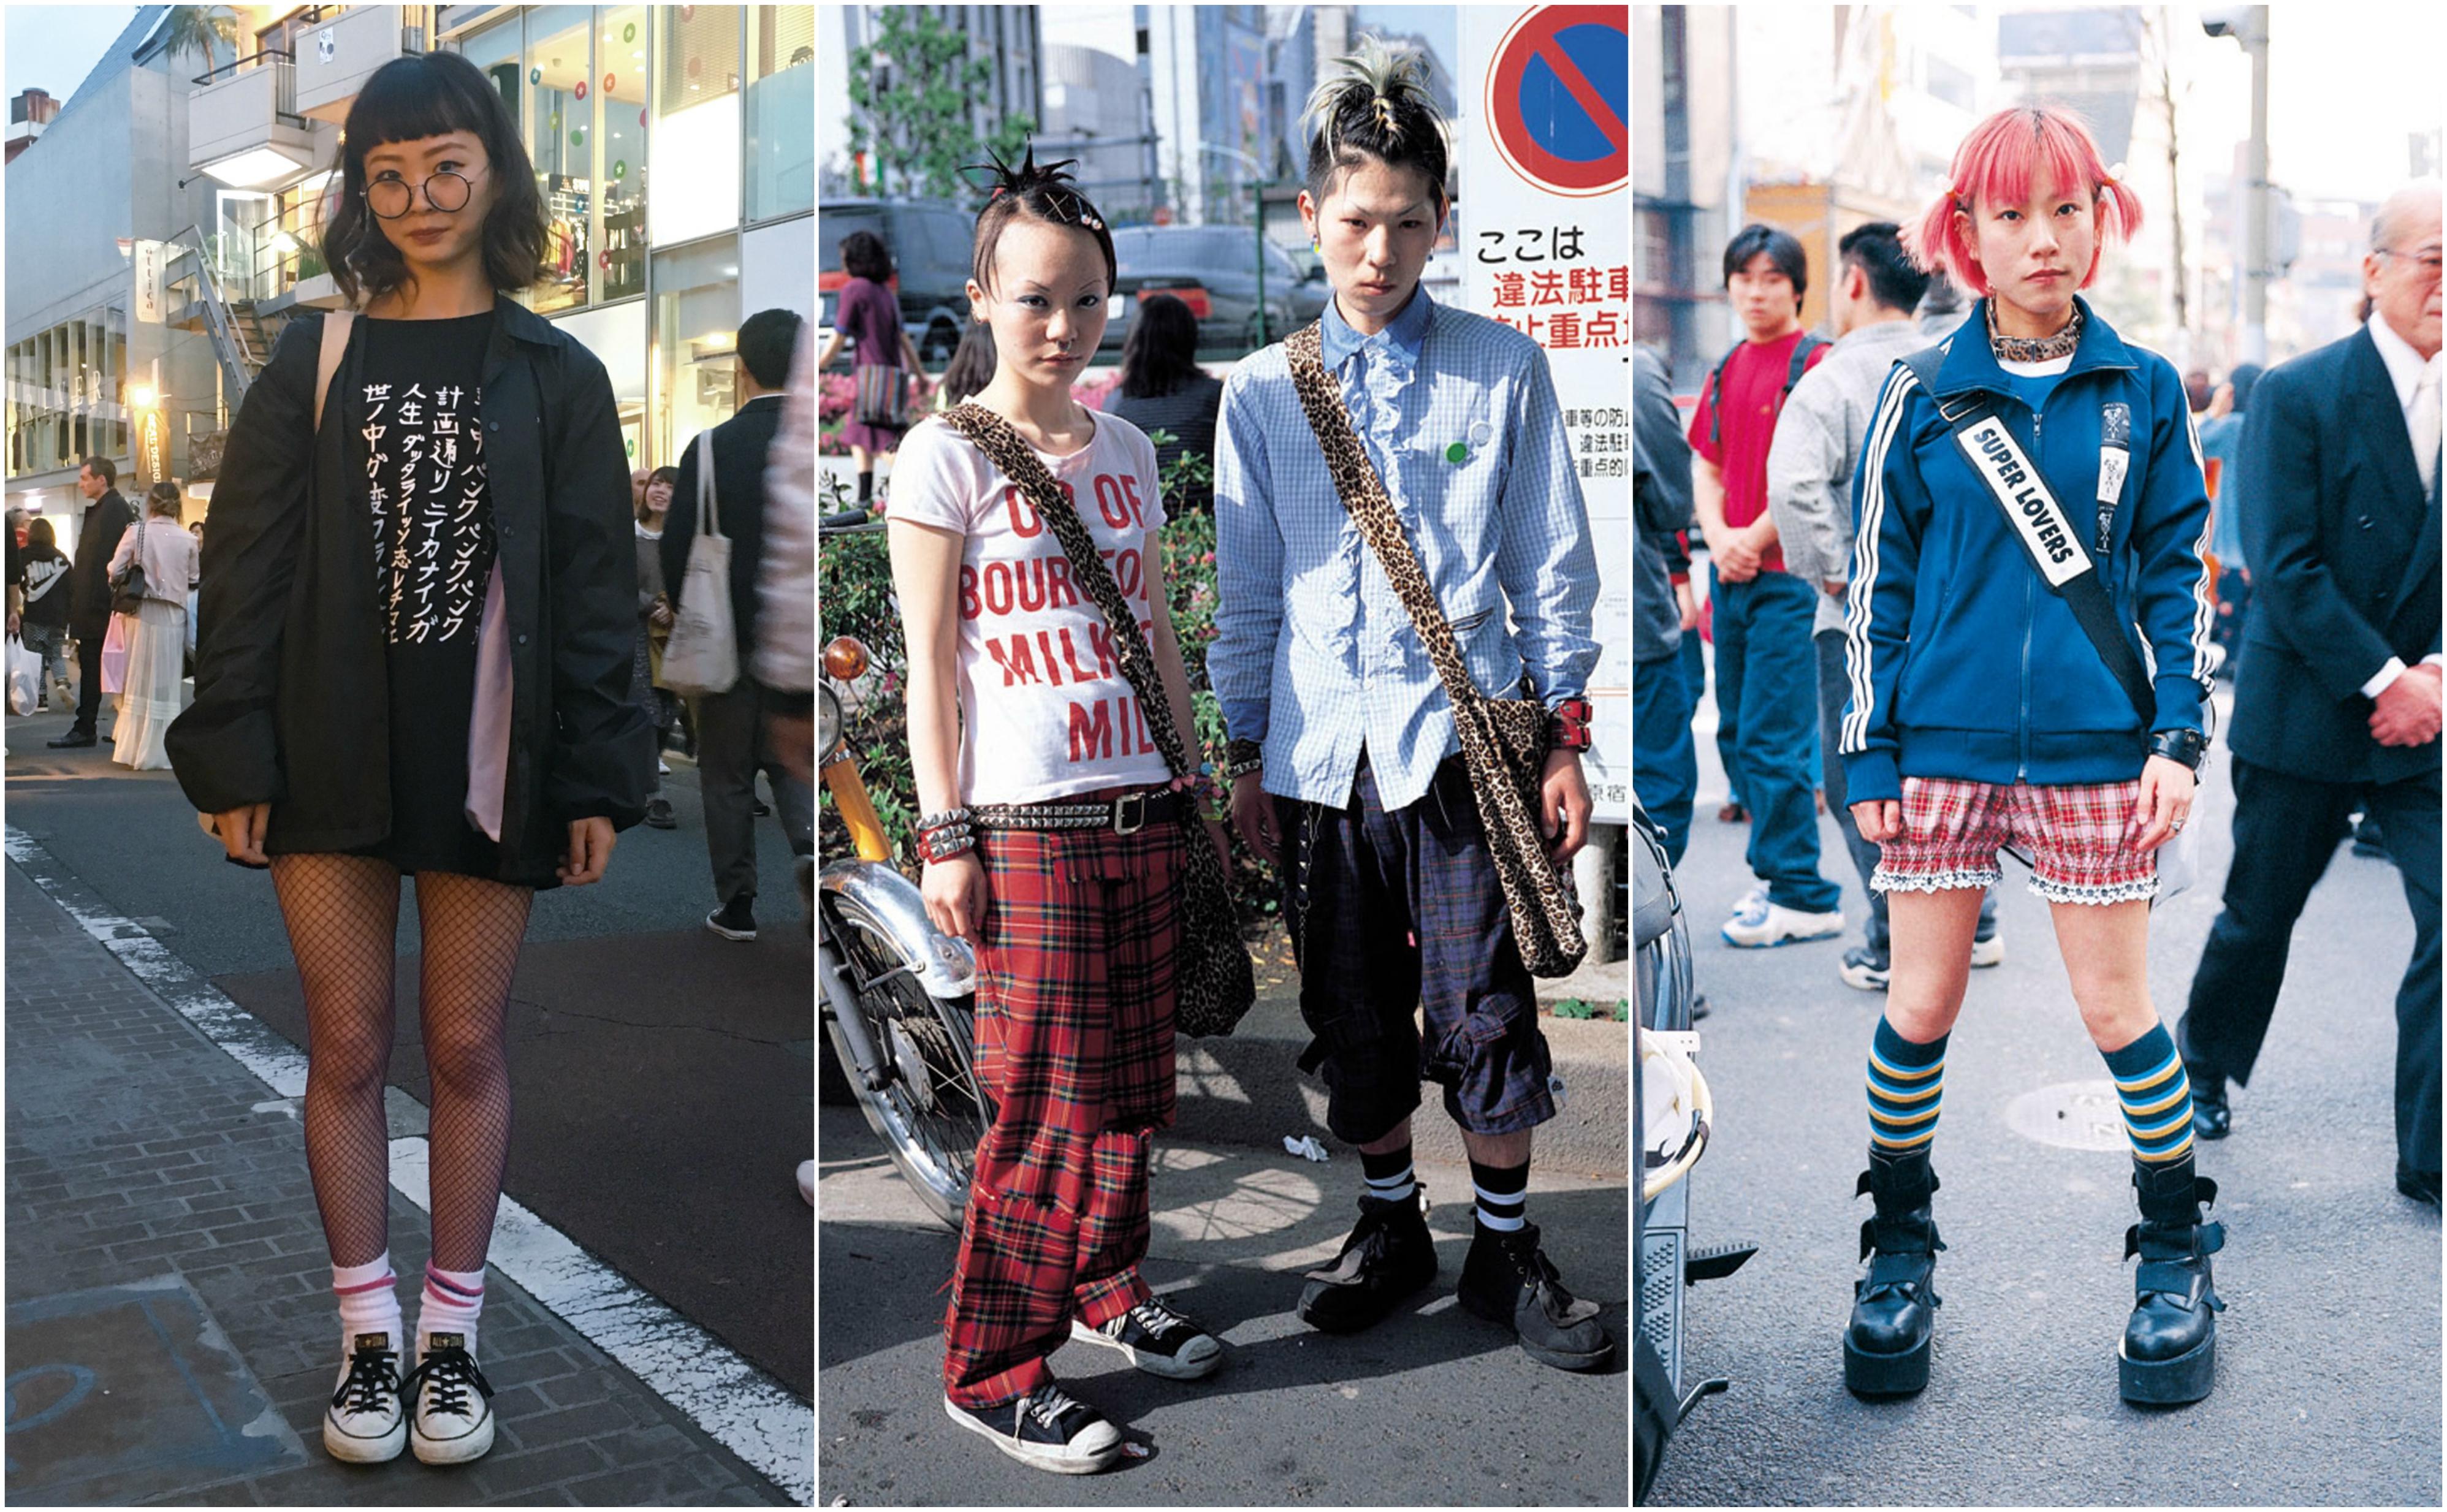 Japan's wild, creative Harajuku street style is dead  Long live